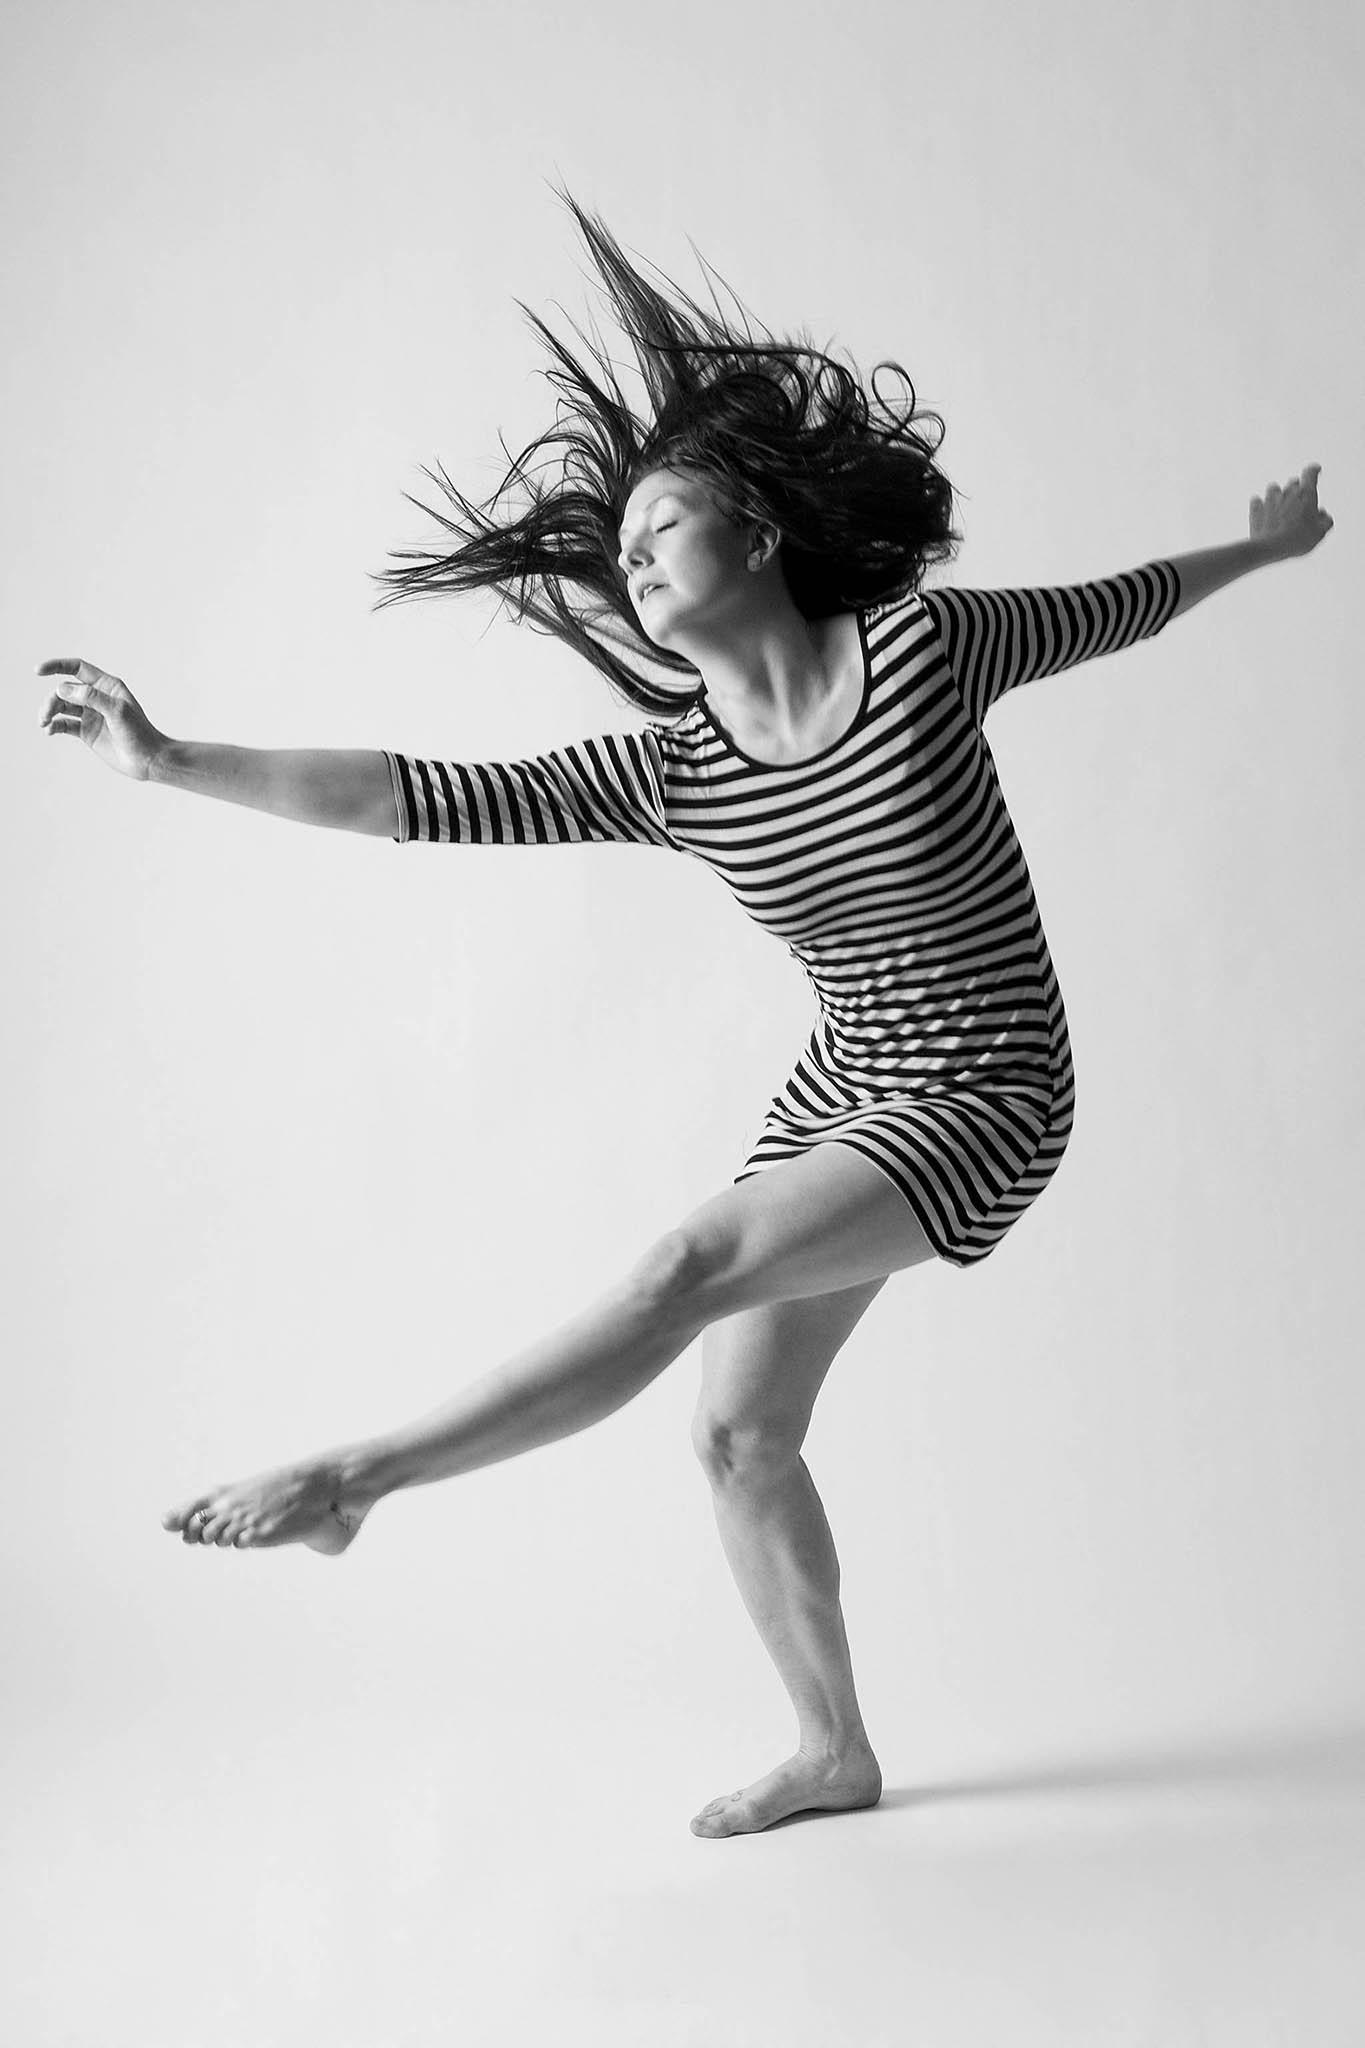 Danser Mette Nagel